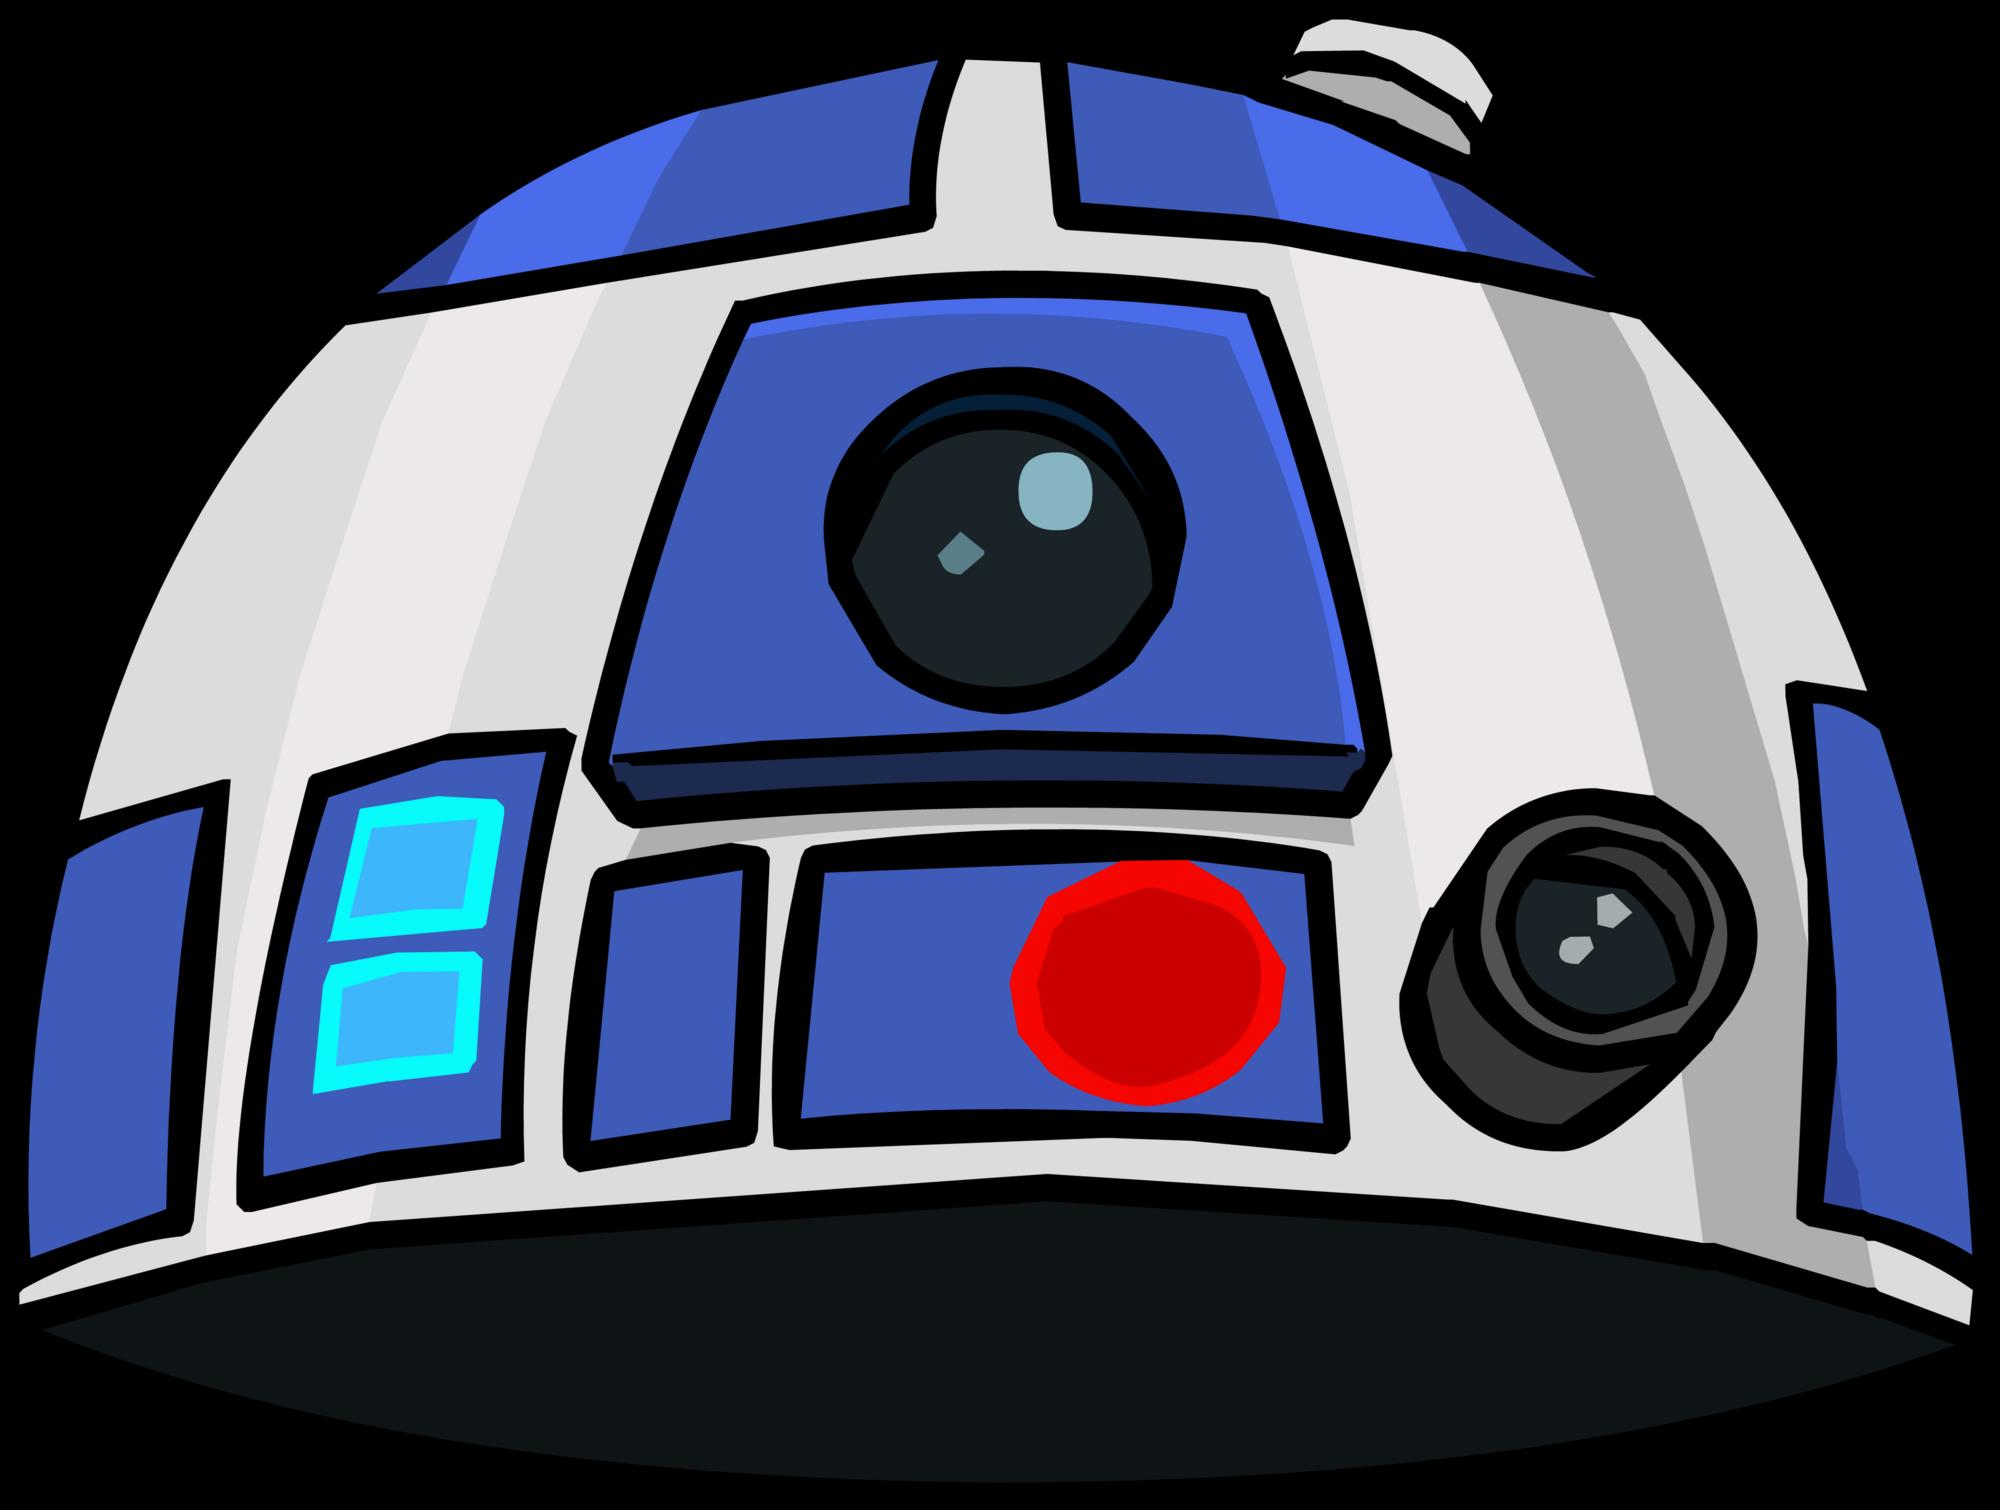 e94fa93e847 R2-D2 Helmet